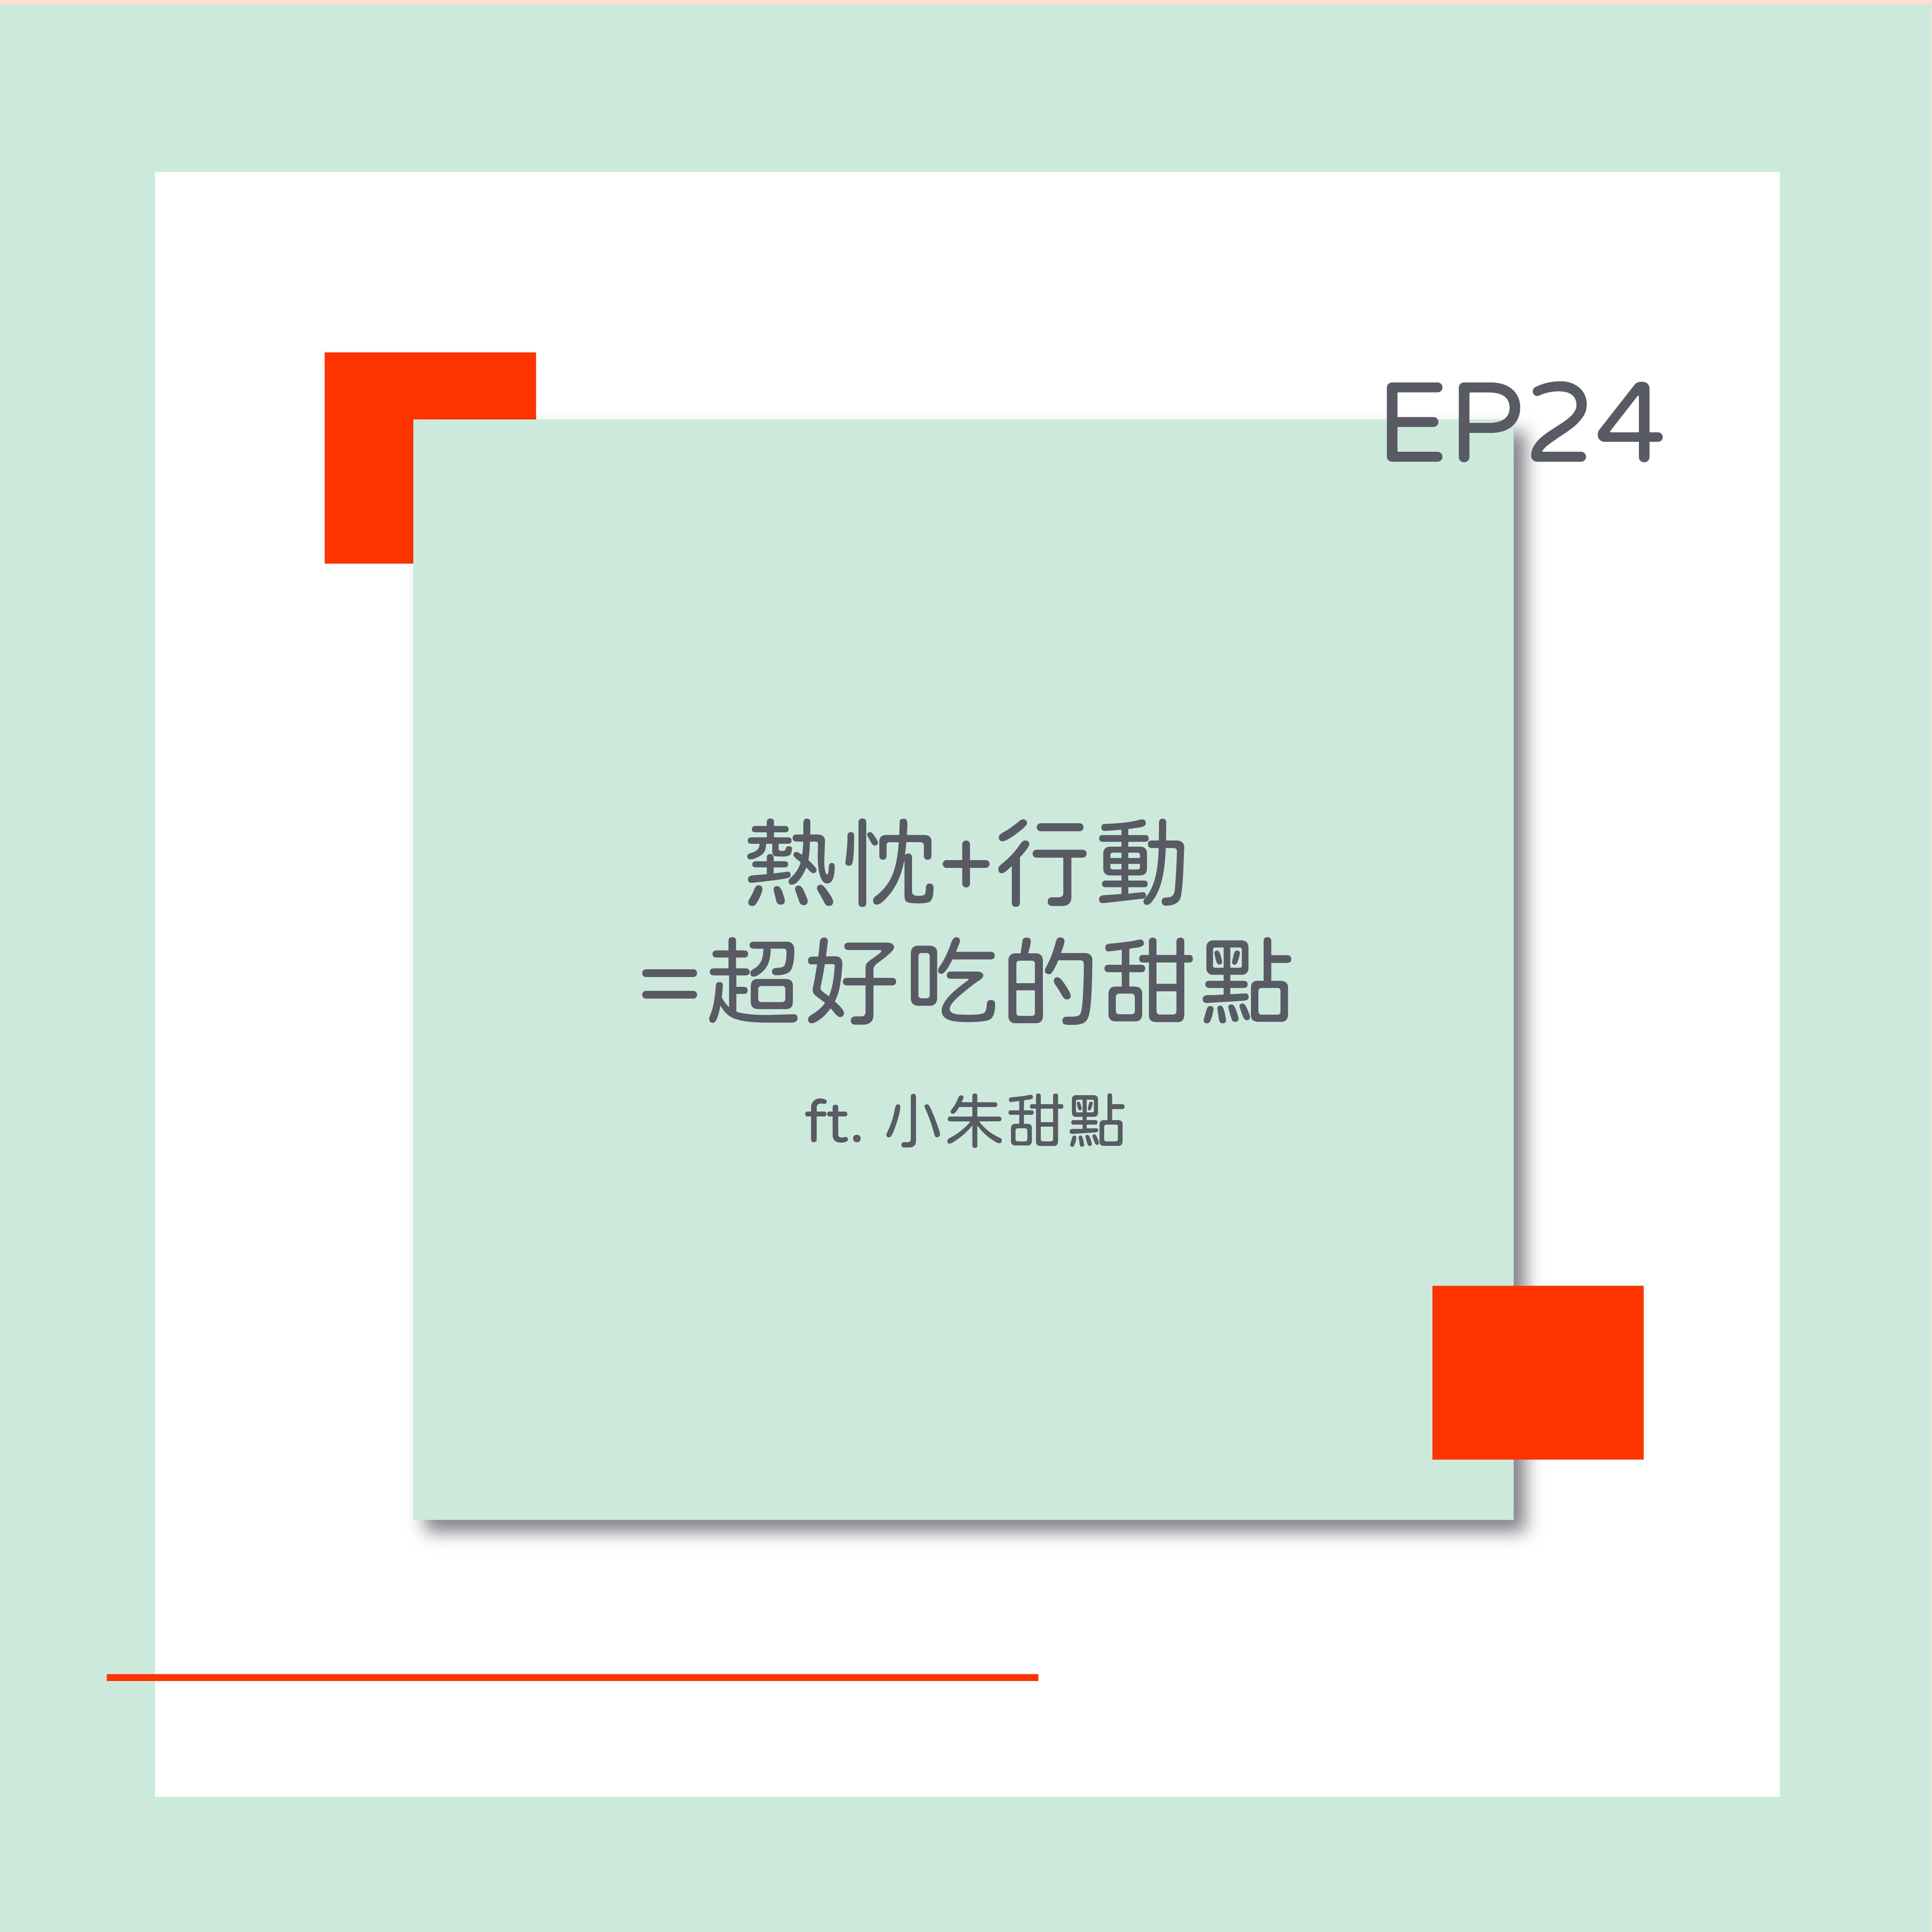 EP24- 熱忱+行動=超好吃的甜點! 小朱甜點